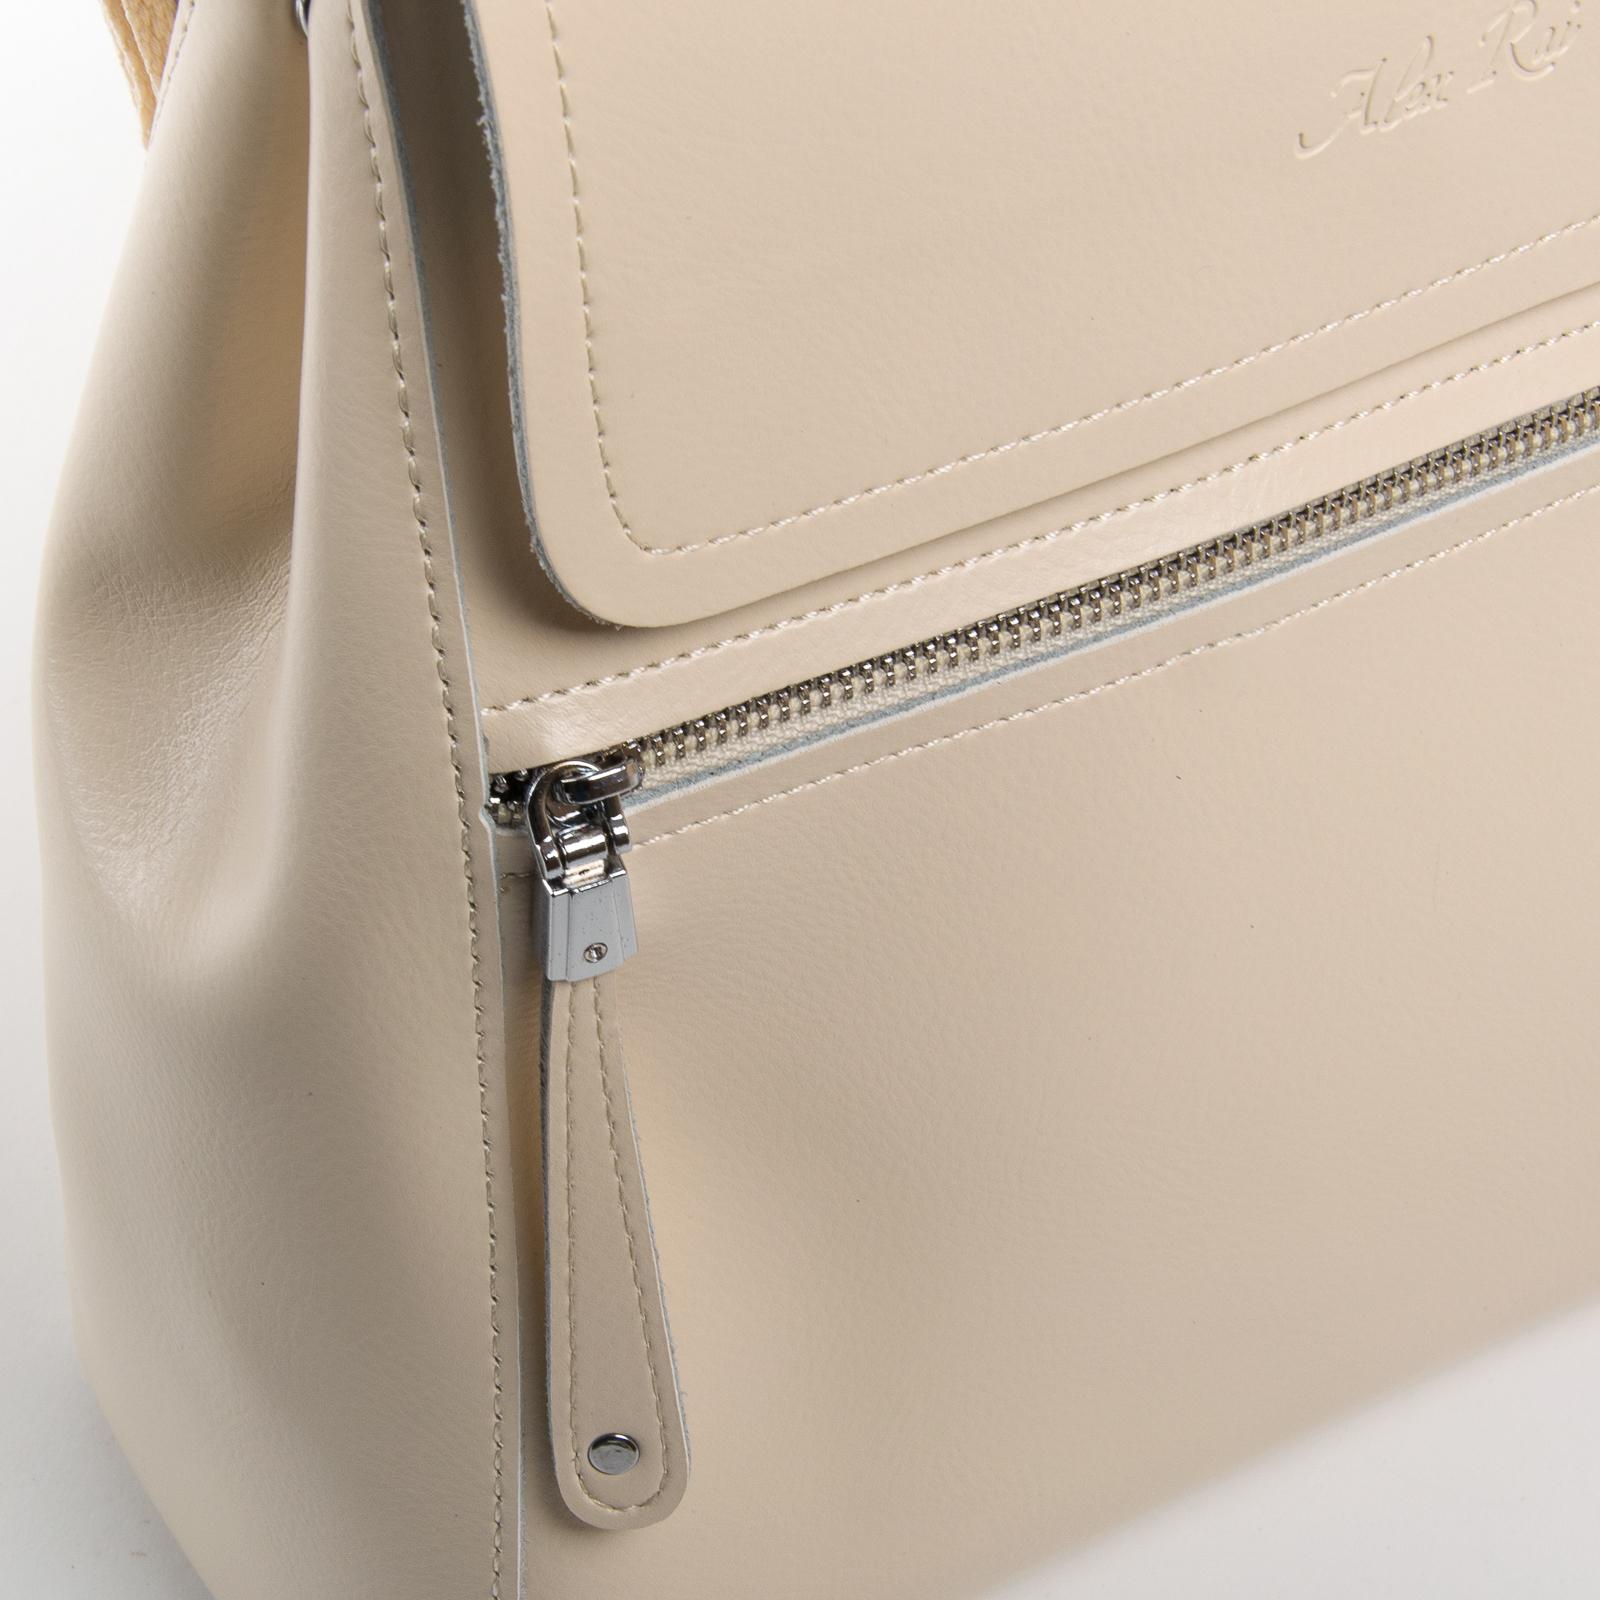 Сумка Женская Рюкзак кожа ALEX RAI 03-01 1005 light-beige - фото 3